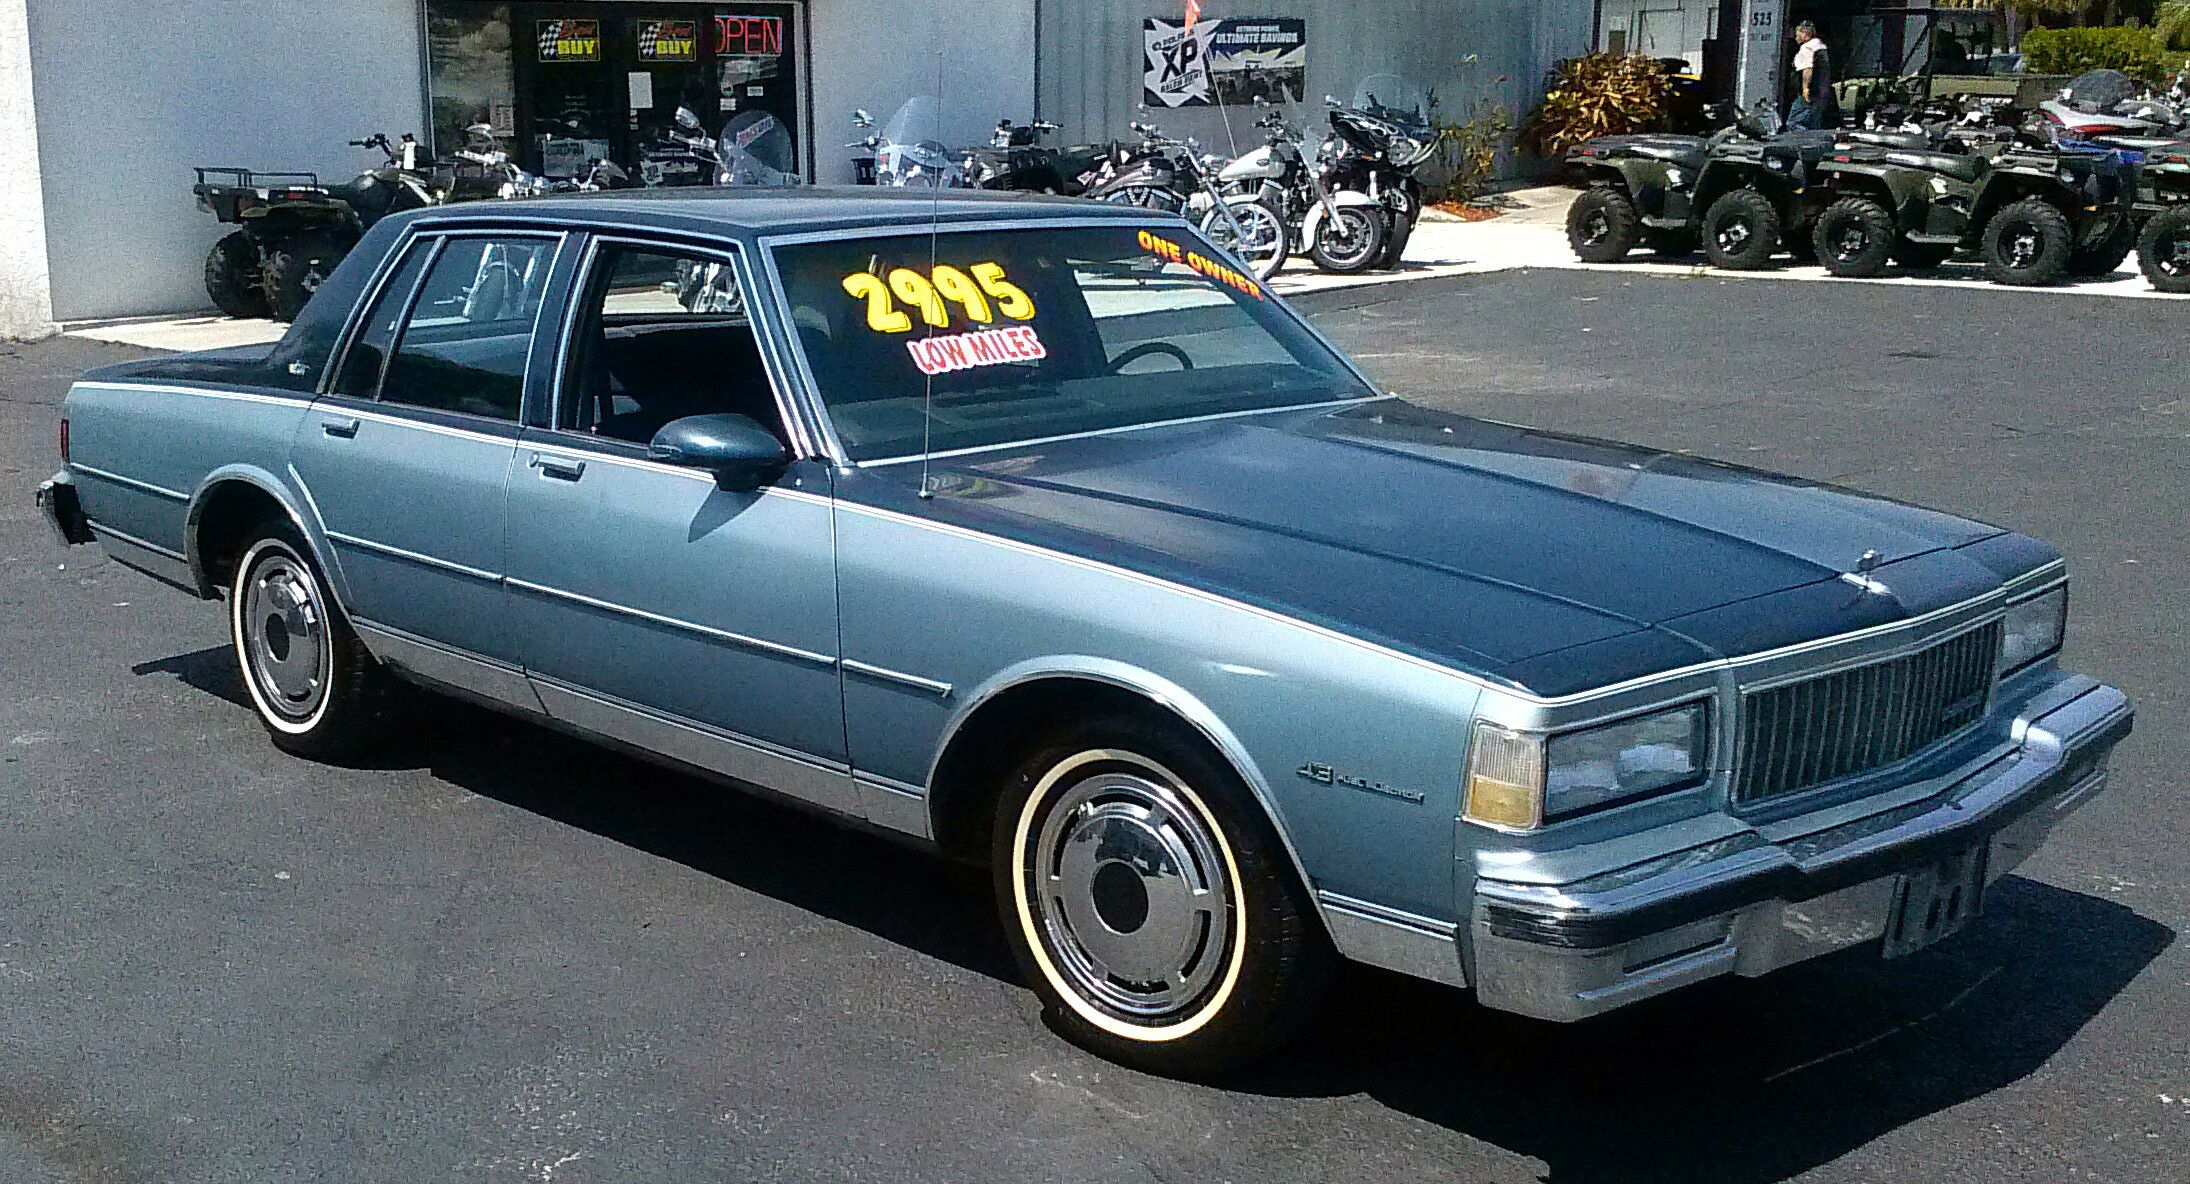 Kelebihan Kekurangan Chevrolet 1980 Review